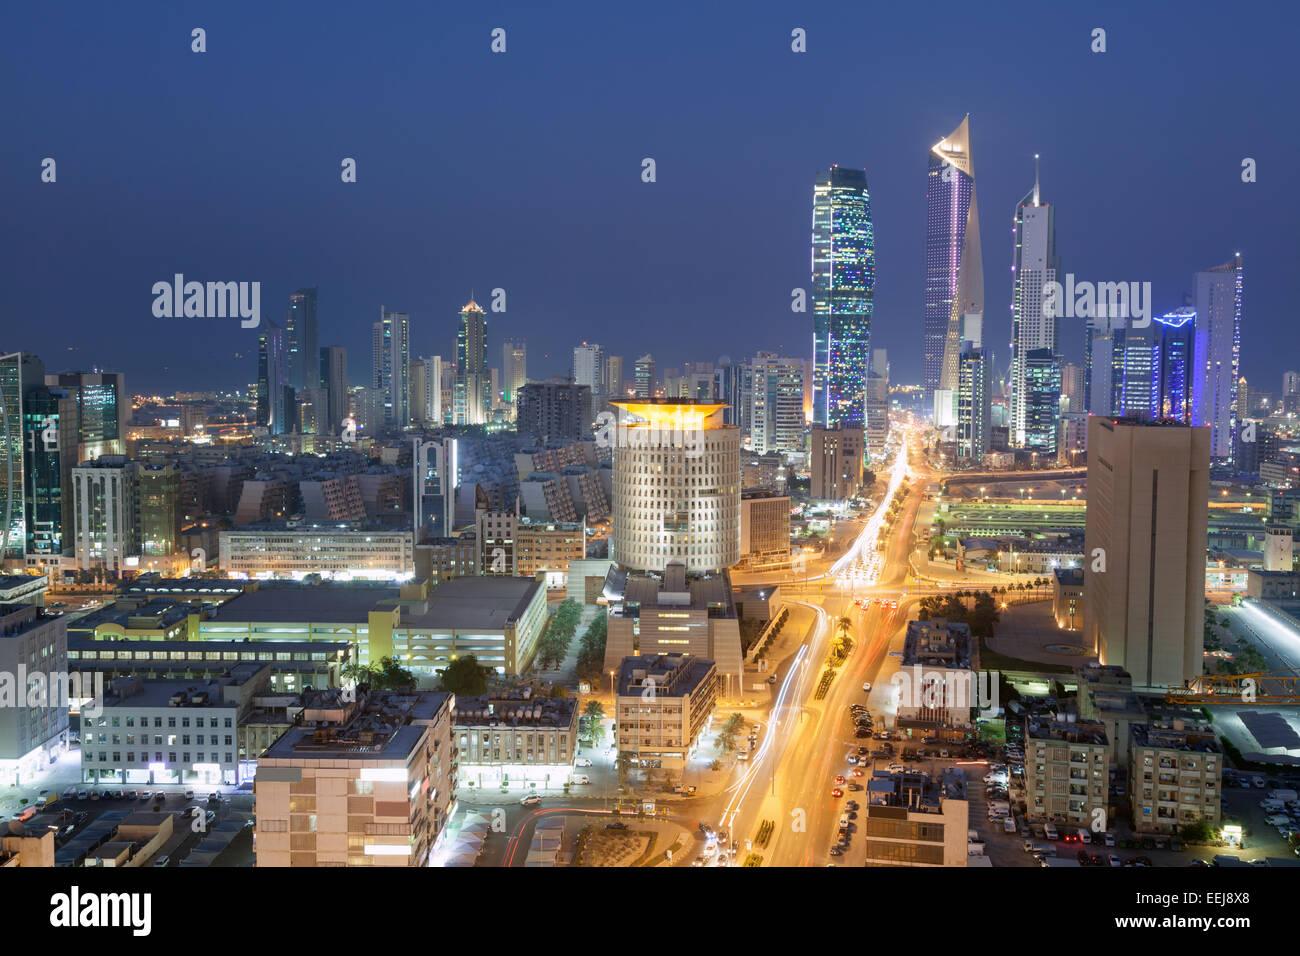 View of Kuwait City at night - Stock Image